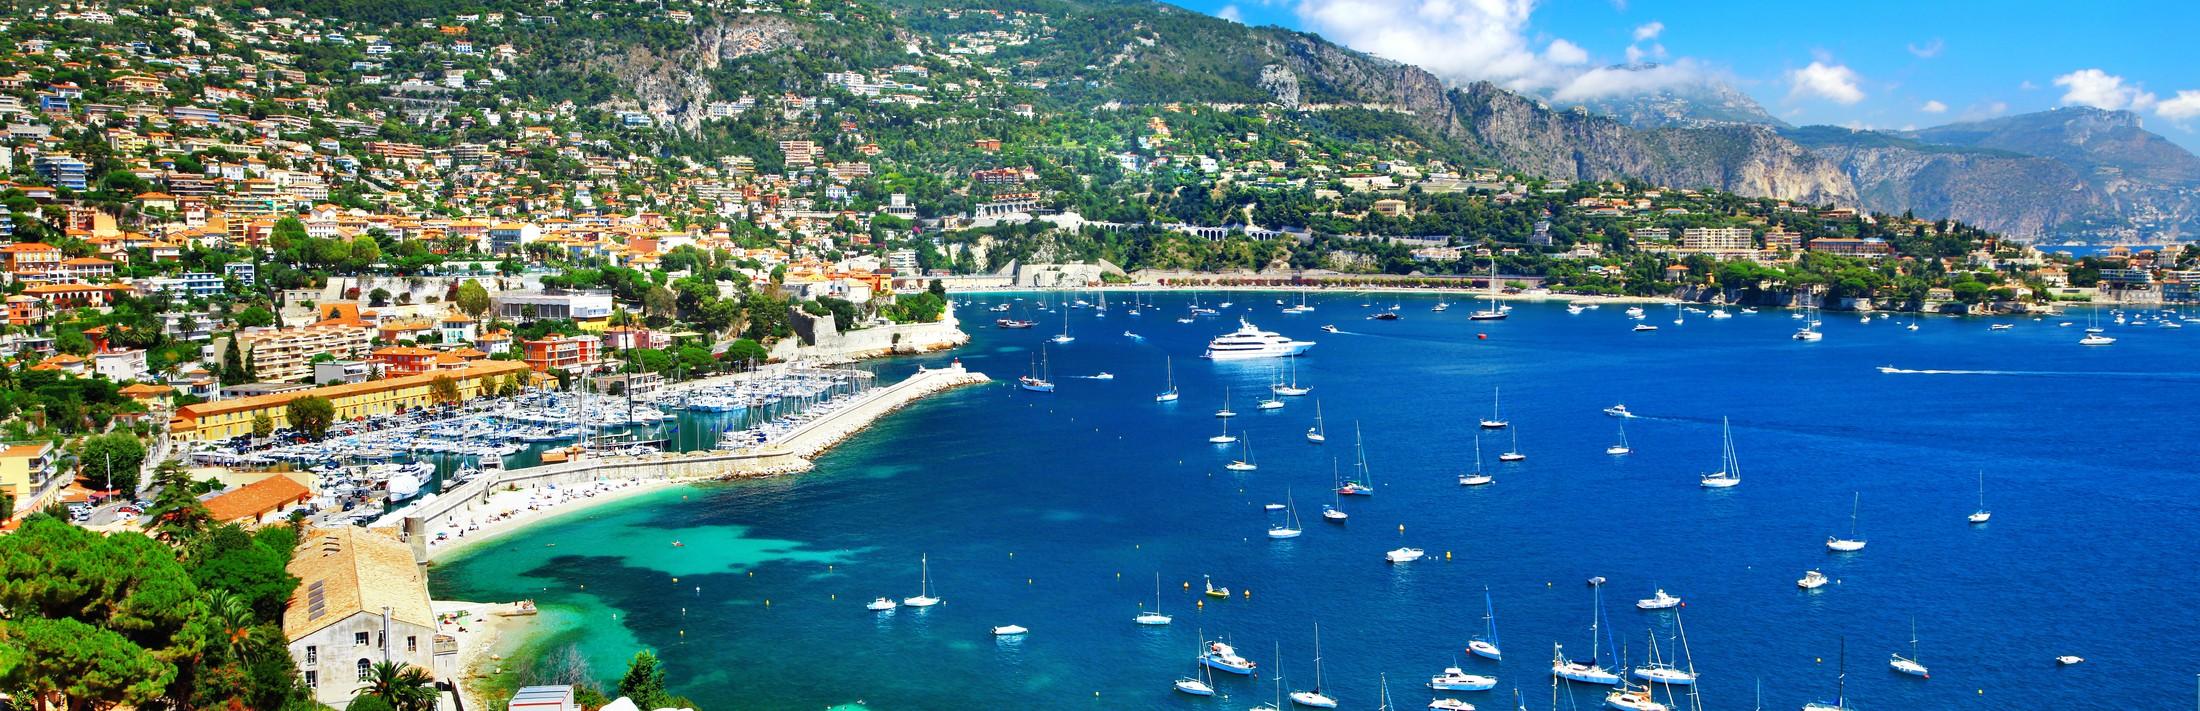 Vue du ciel sur la baie de Nice